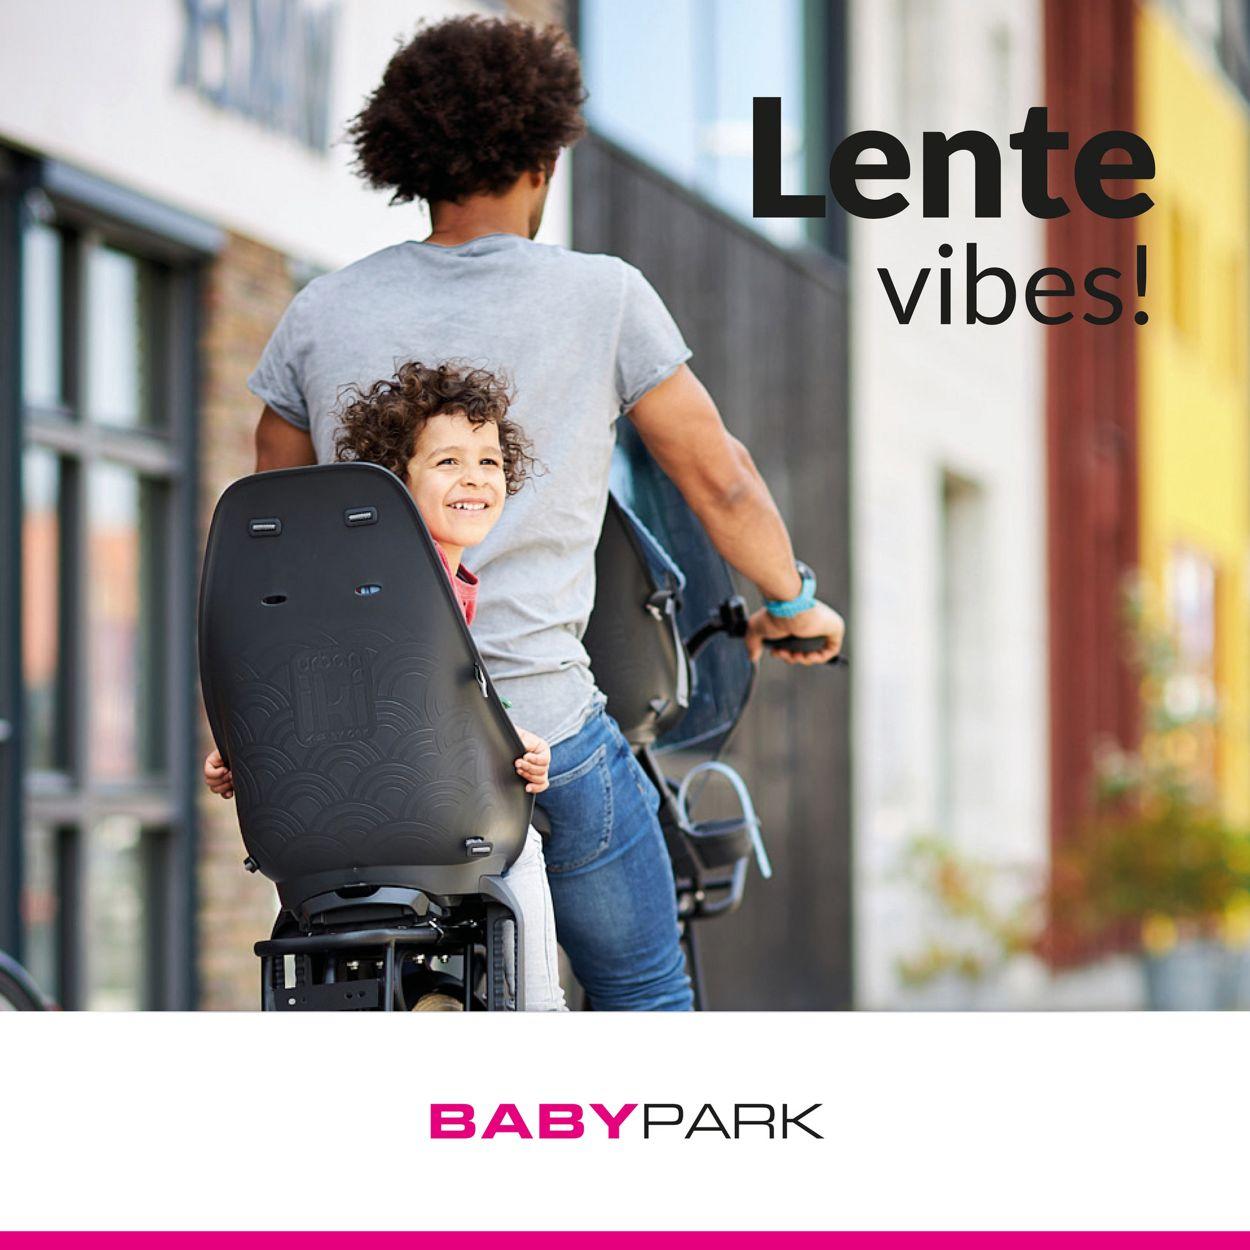 Catalogus van Babypark van 20.04.2021